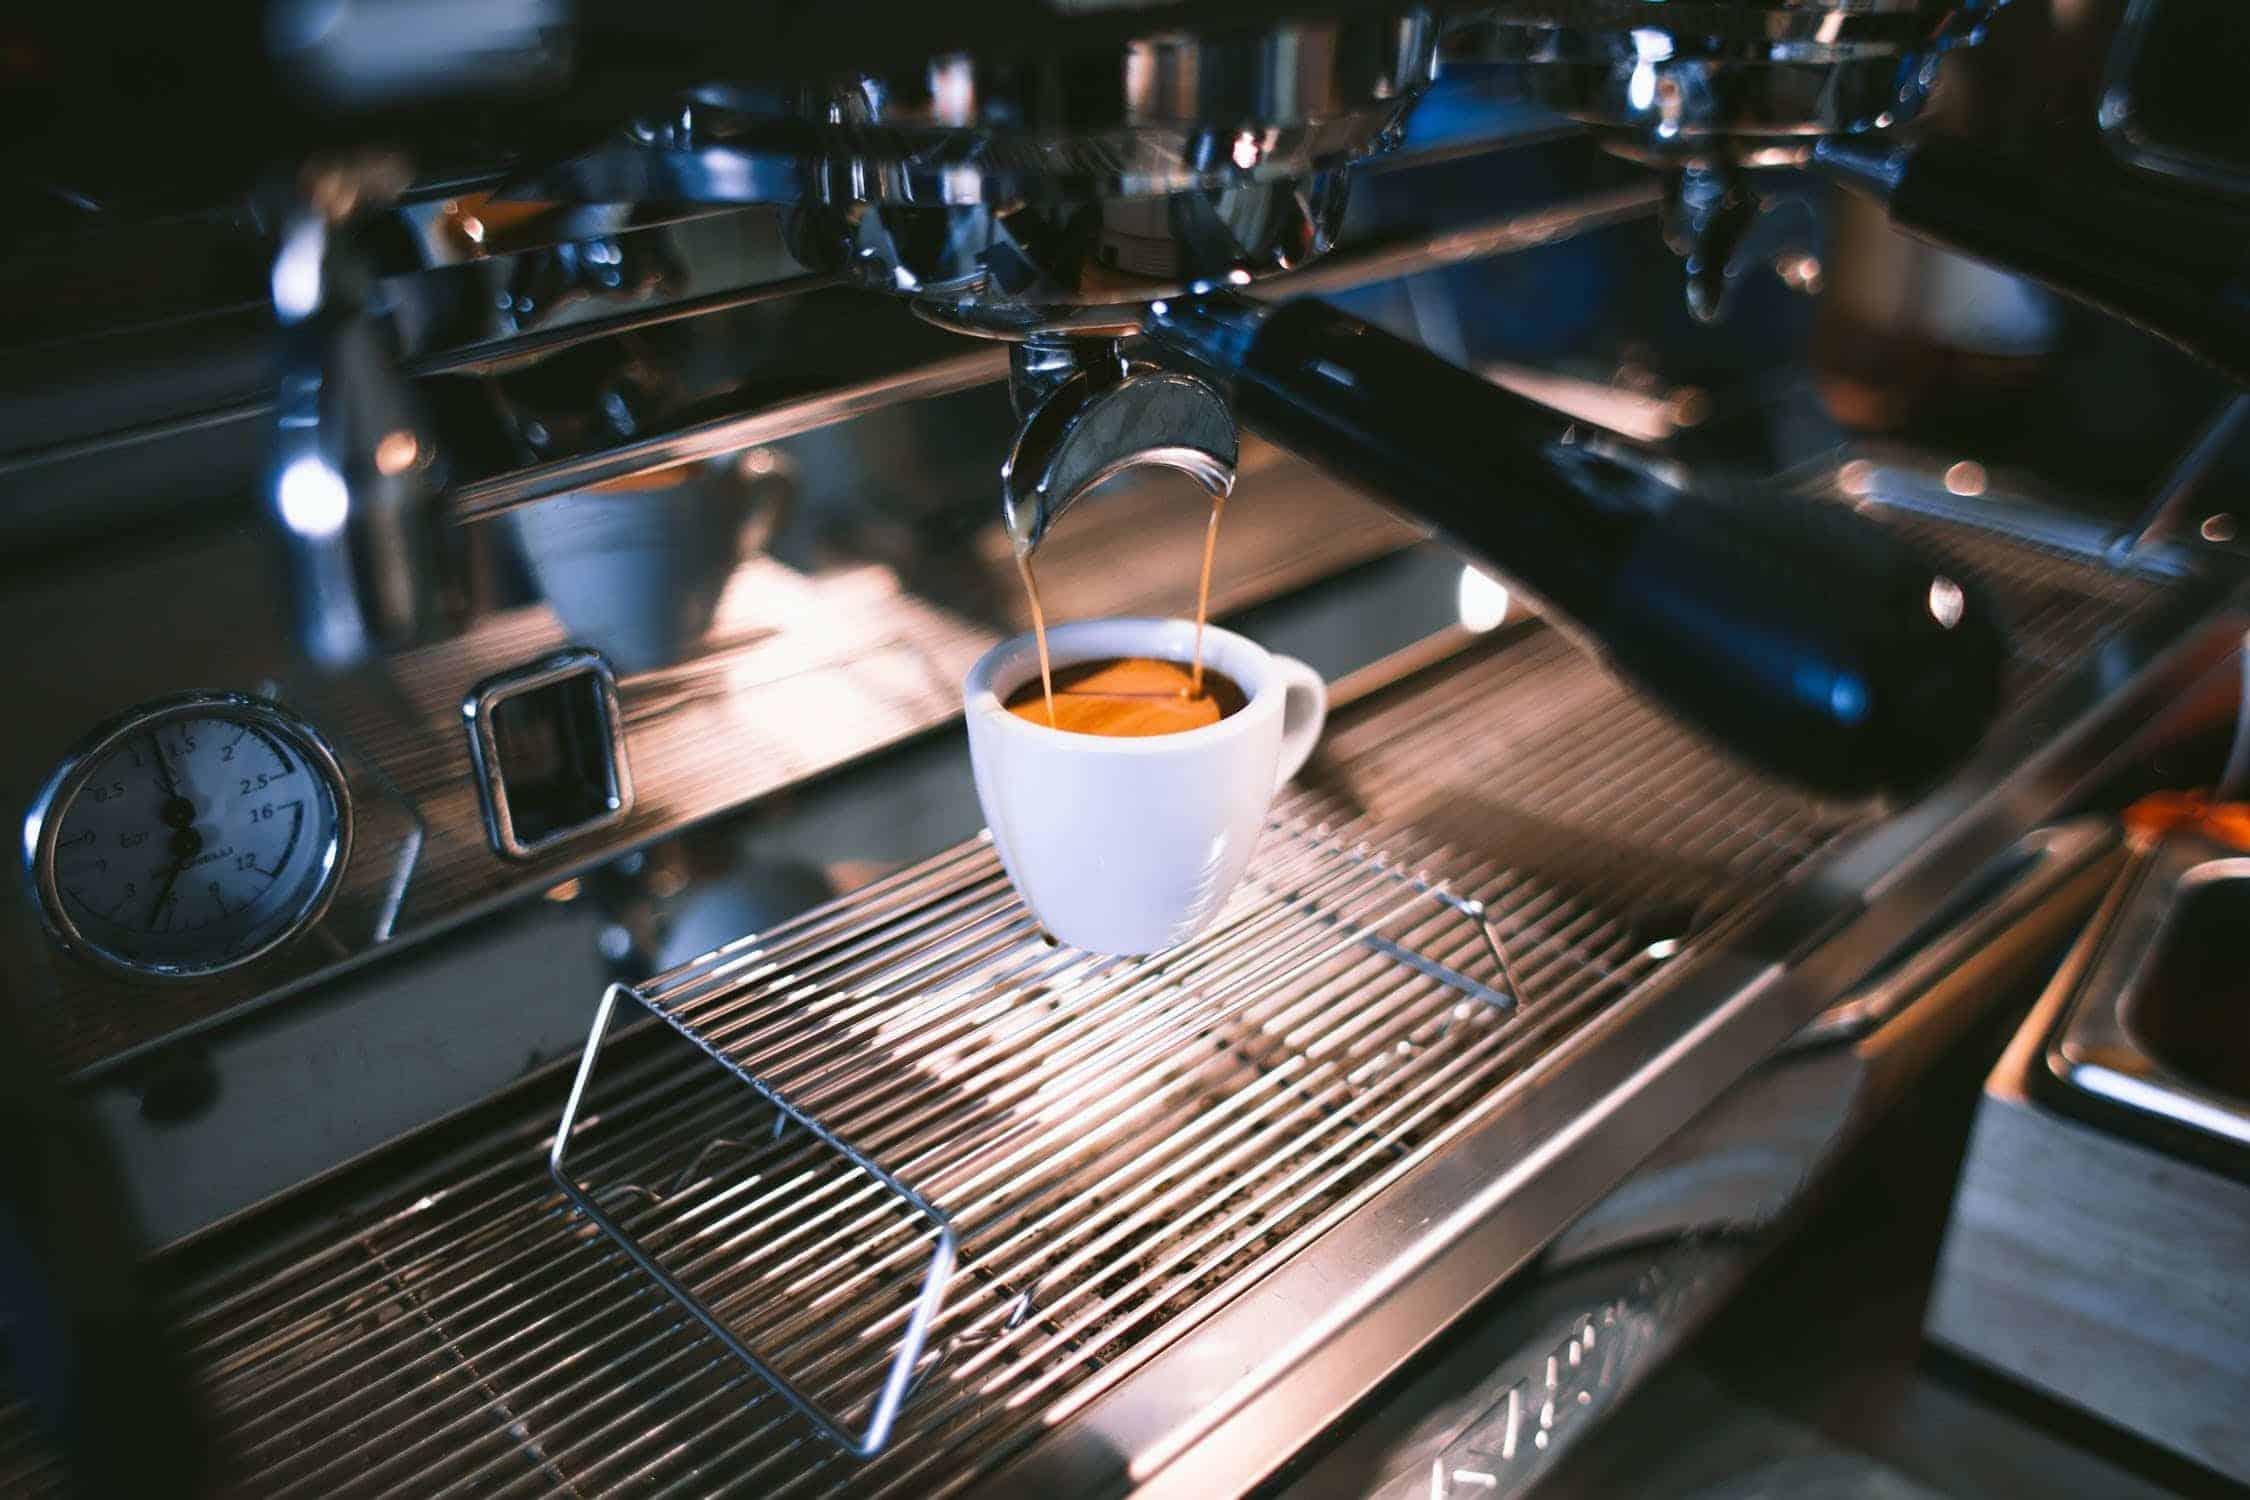 3 Factors to Help You Compare Espresso Machines